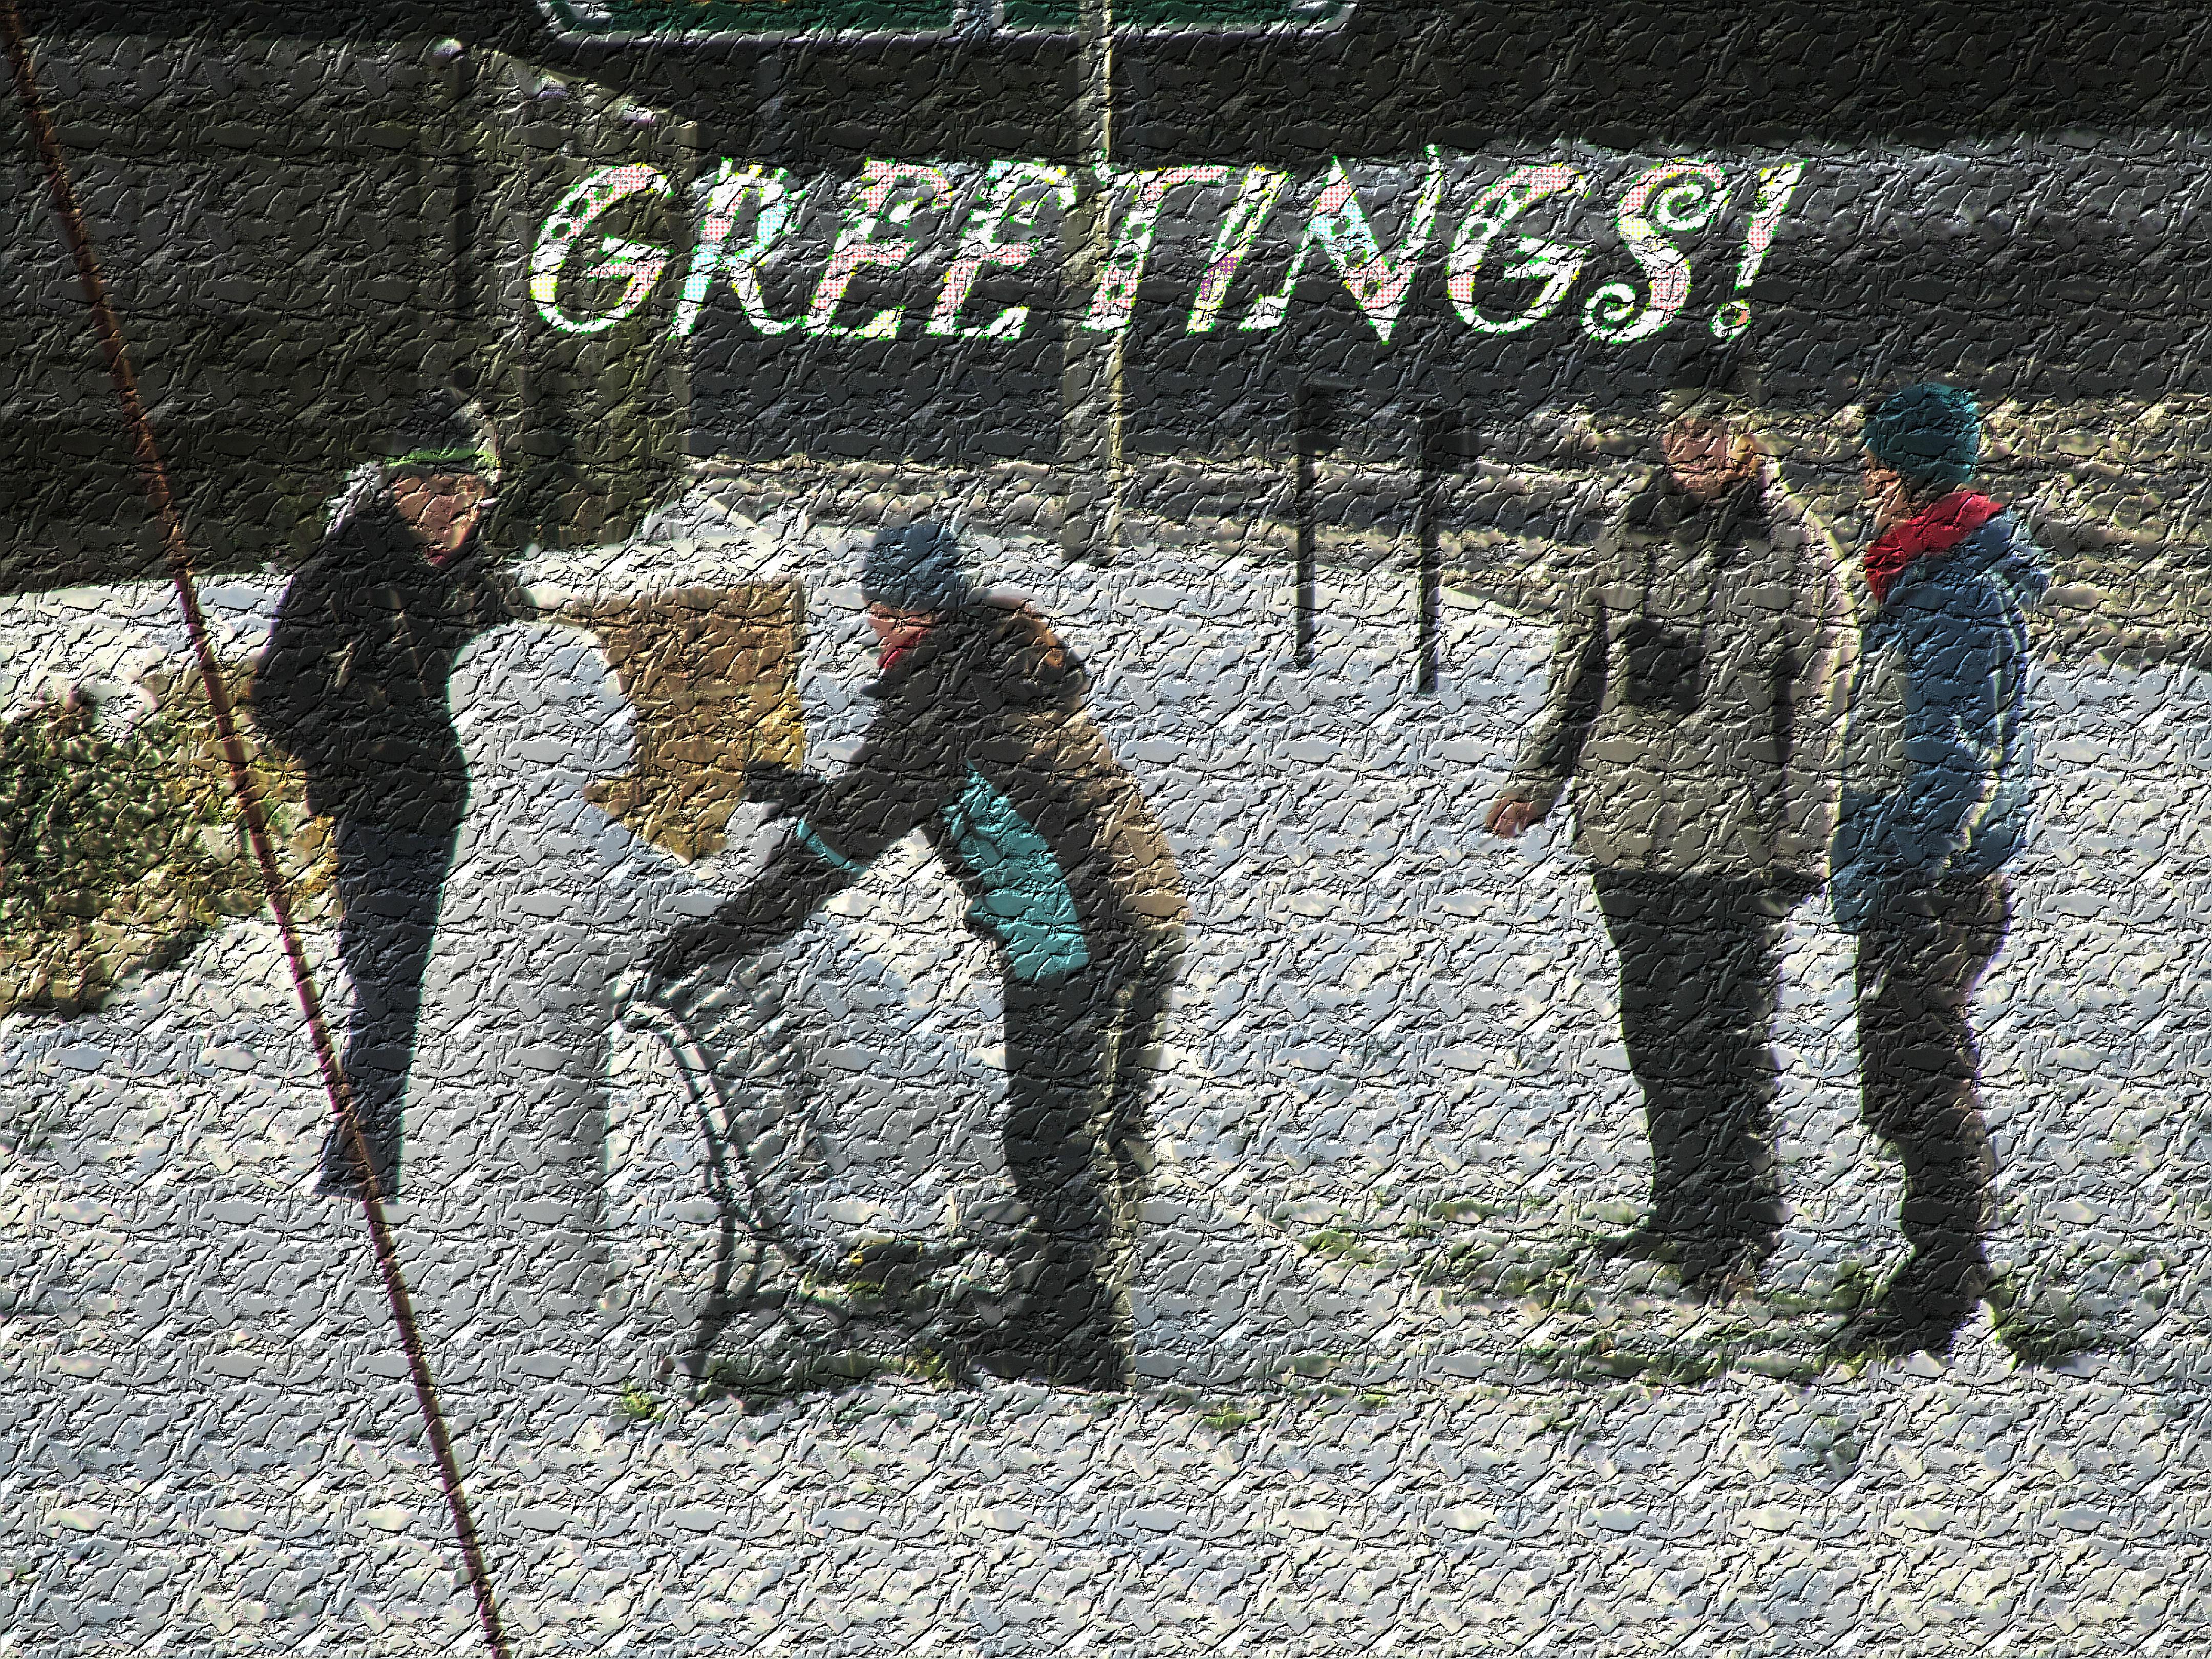 Christmas Greetings ©Cynthia Snowden